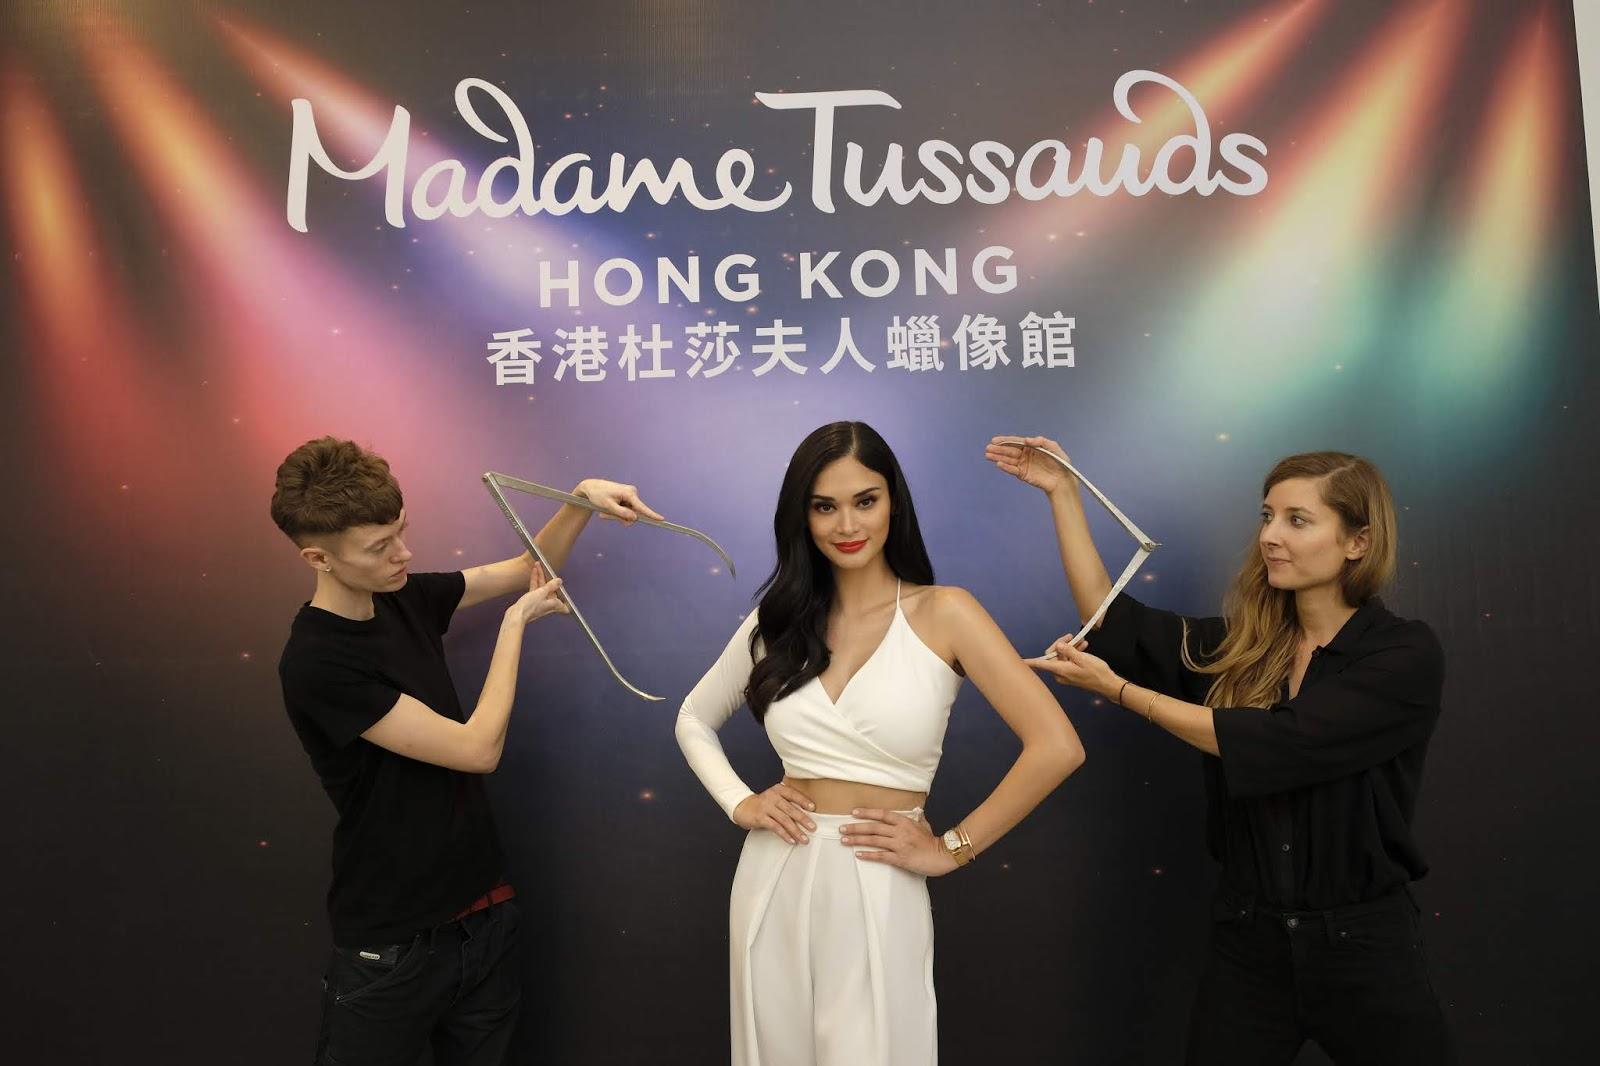 Madame Tussauds Hong Kong: Pia Wurtzbach as the First Filipino Wax